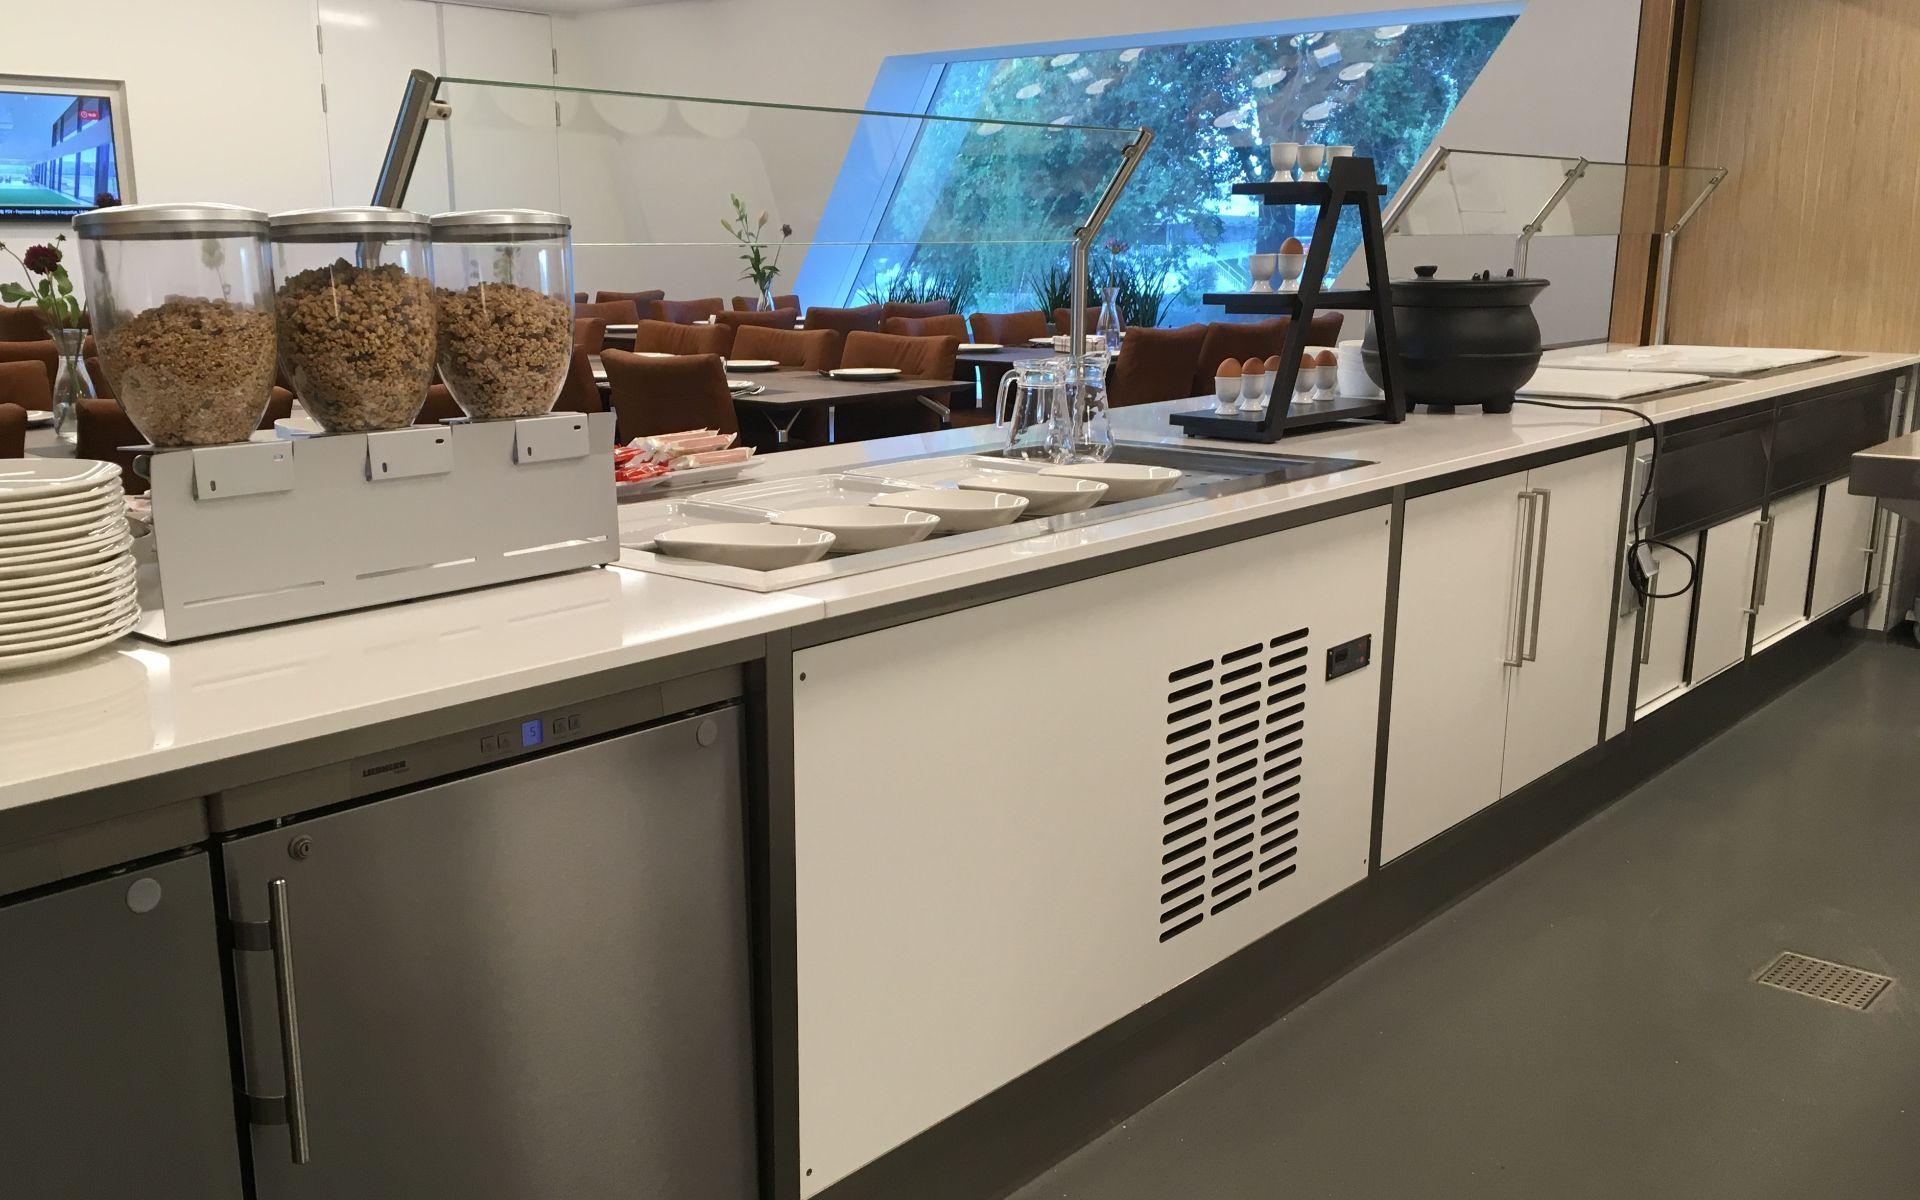 Bedrijfsrestaurant Feyenoord